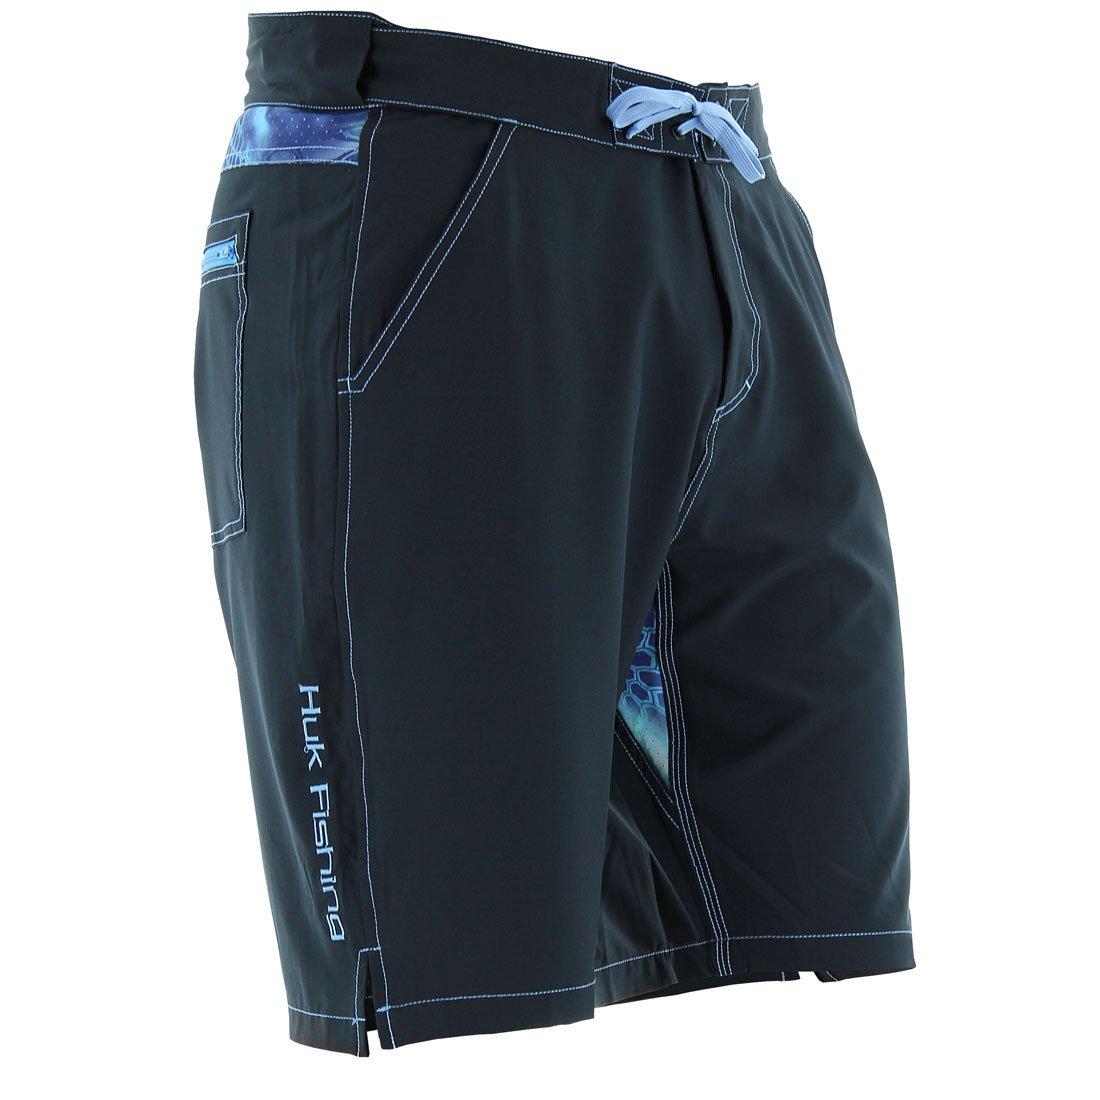 Huk Men's Next Level Board Short, Black, X-Large